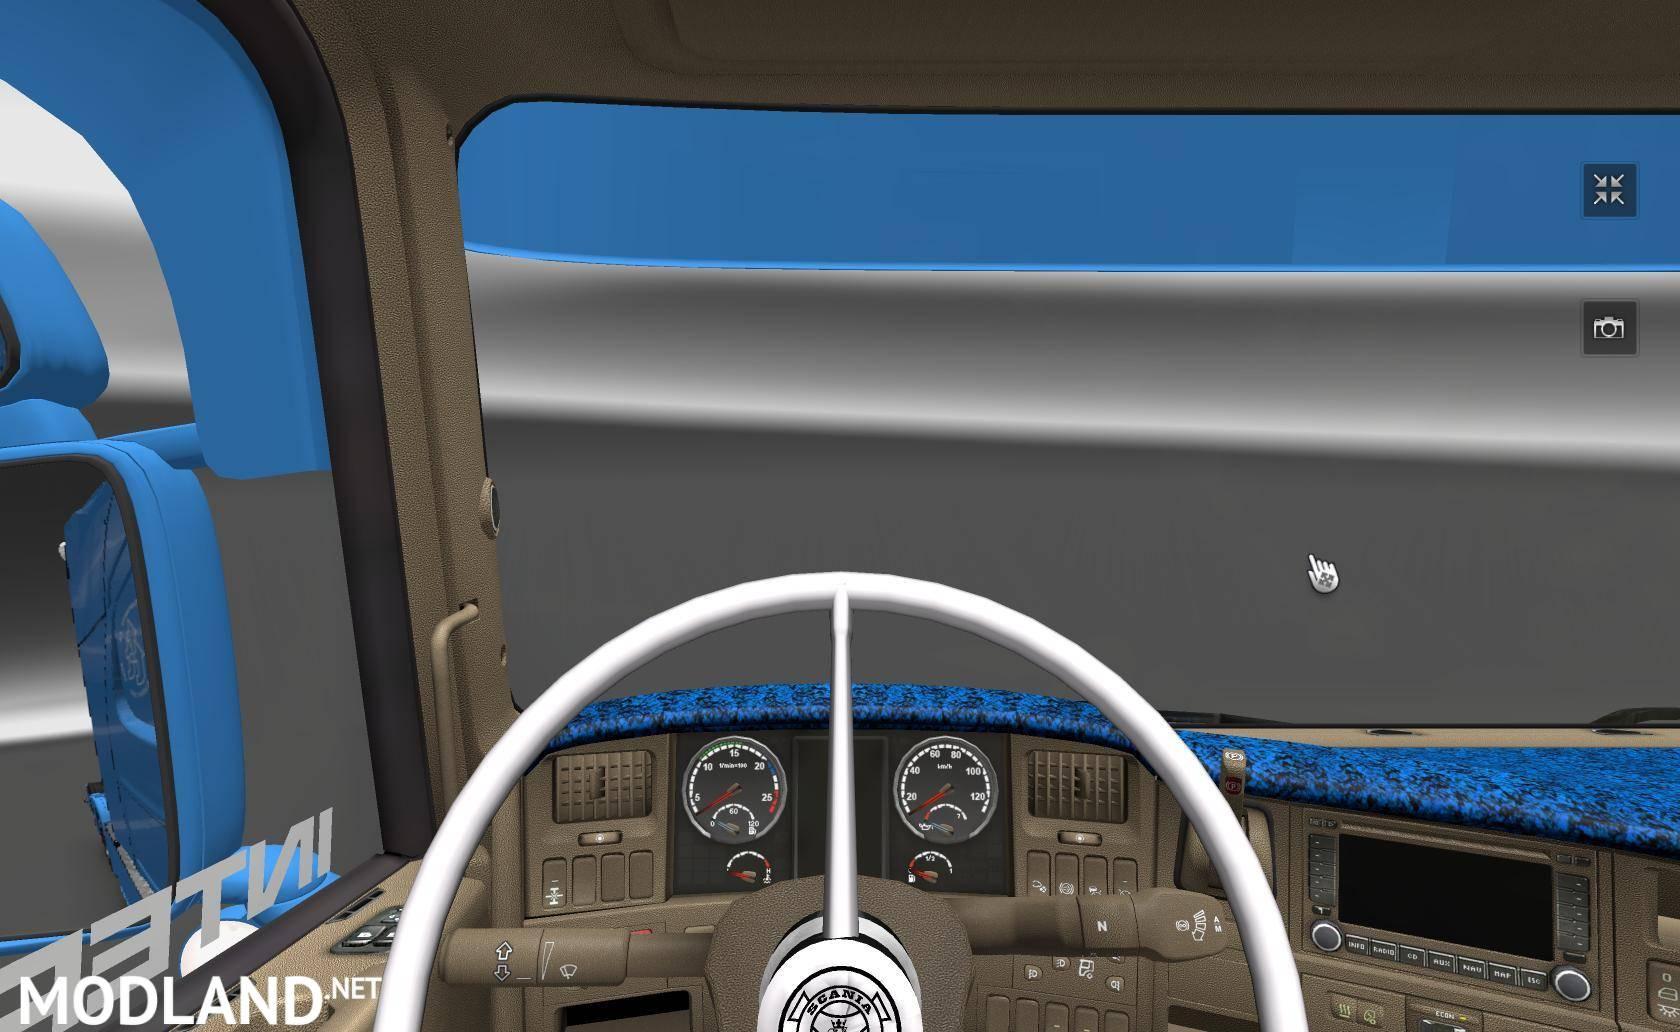 download euro truck simulator 2 and crack | Diễn Đàn Kiếm